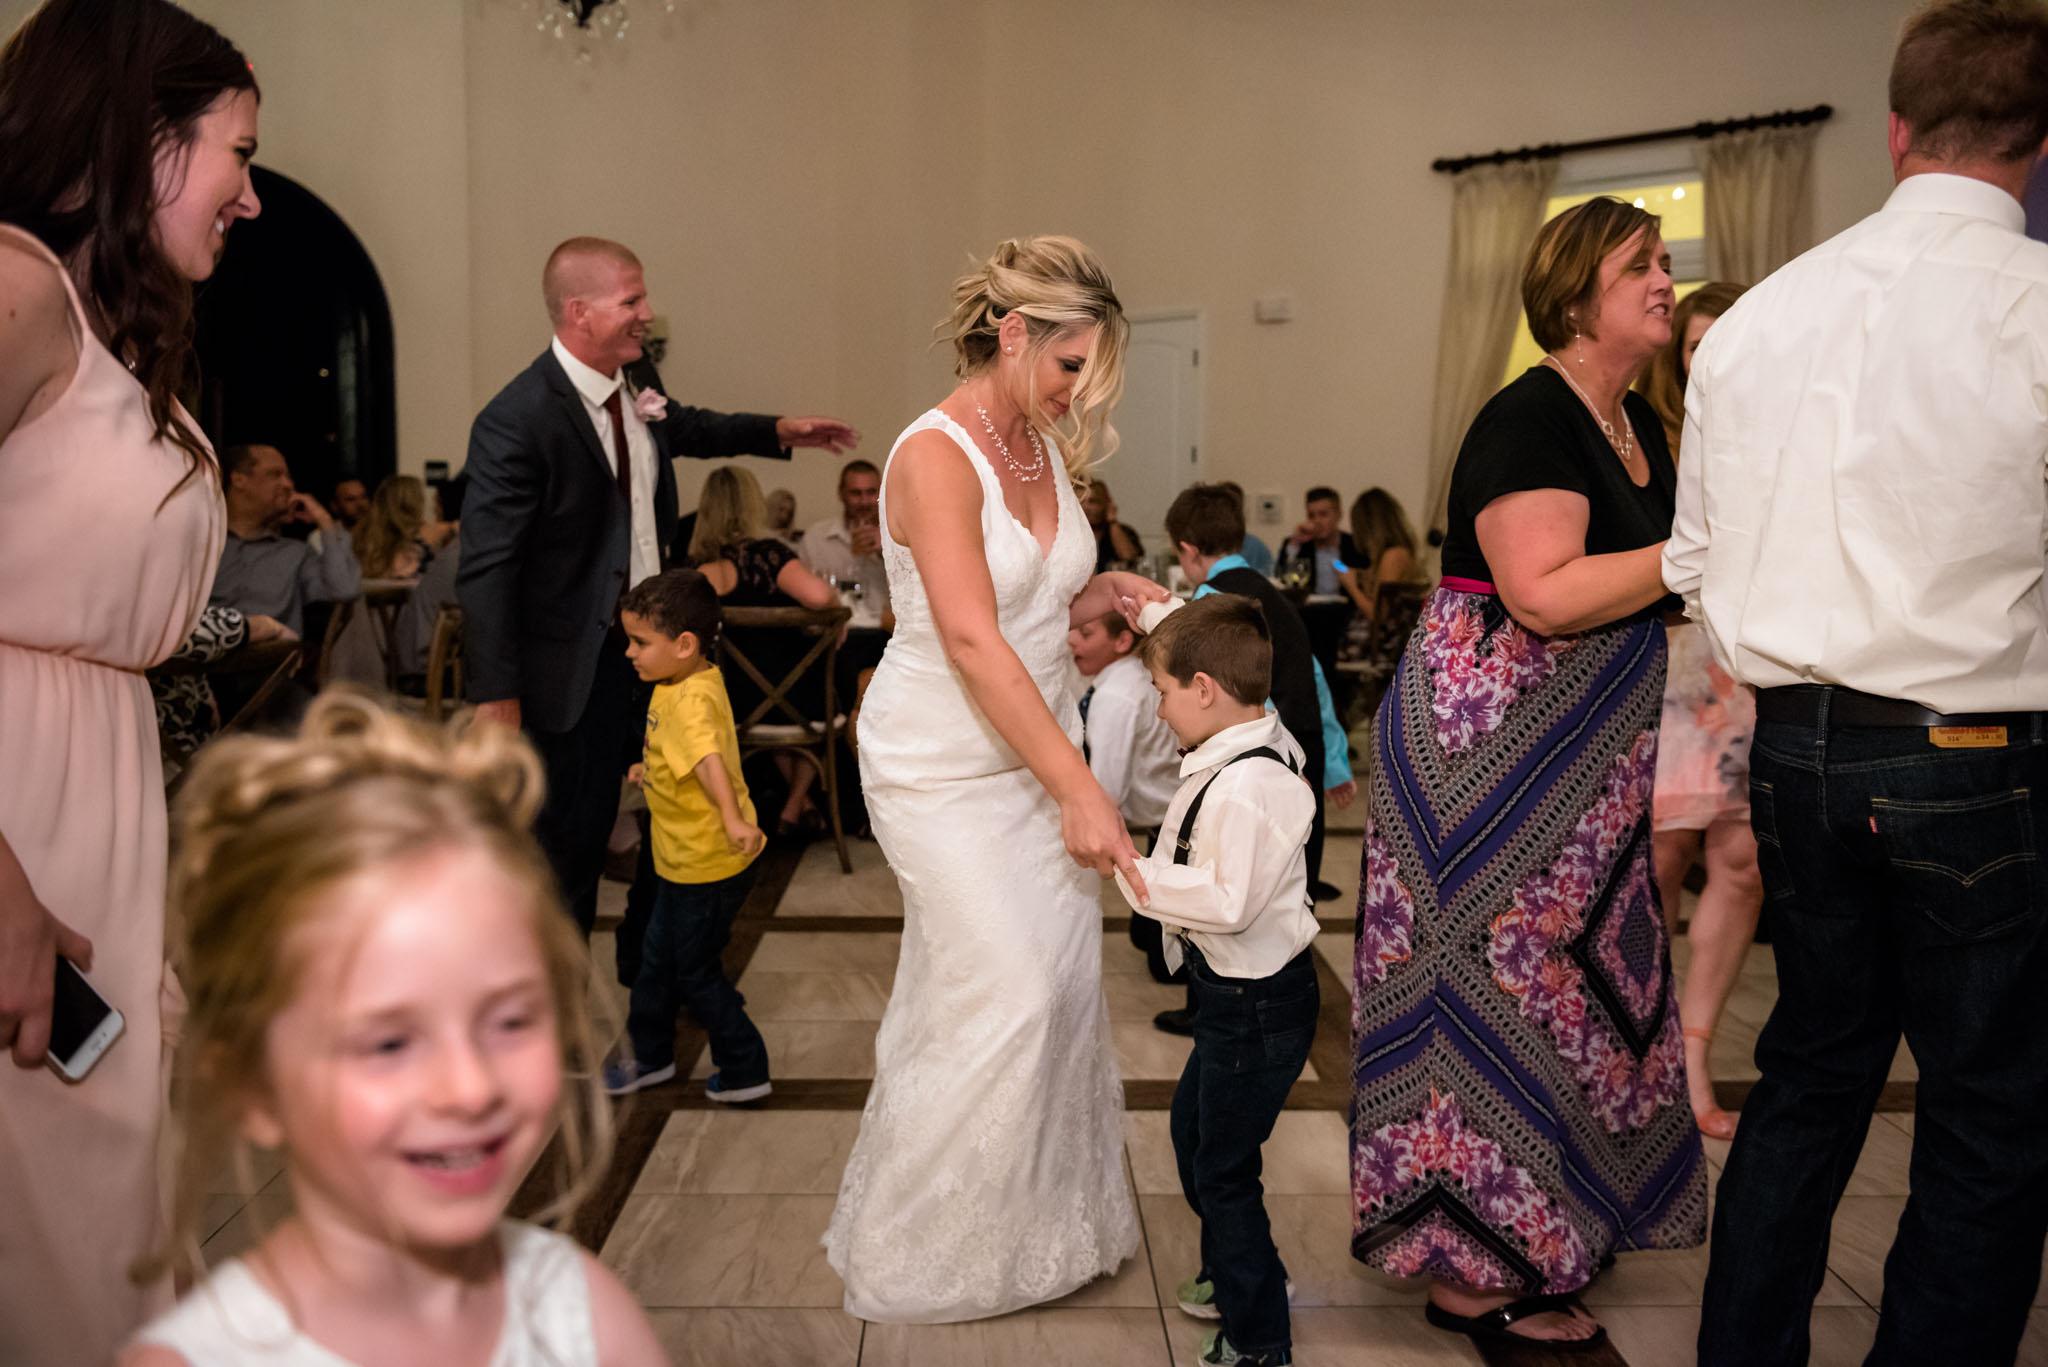 Avensole-Winery-Temecula-Wedding-Josh-and-Olivia-4198.JPG